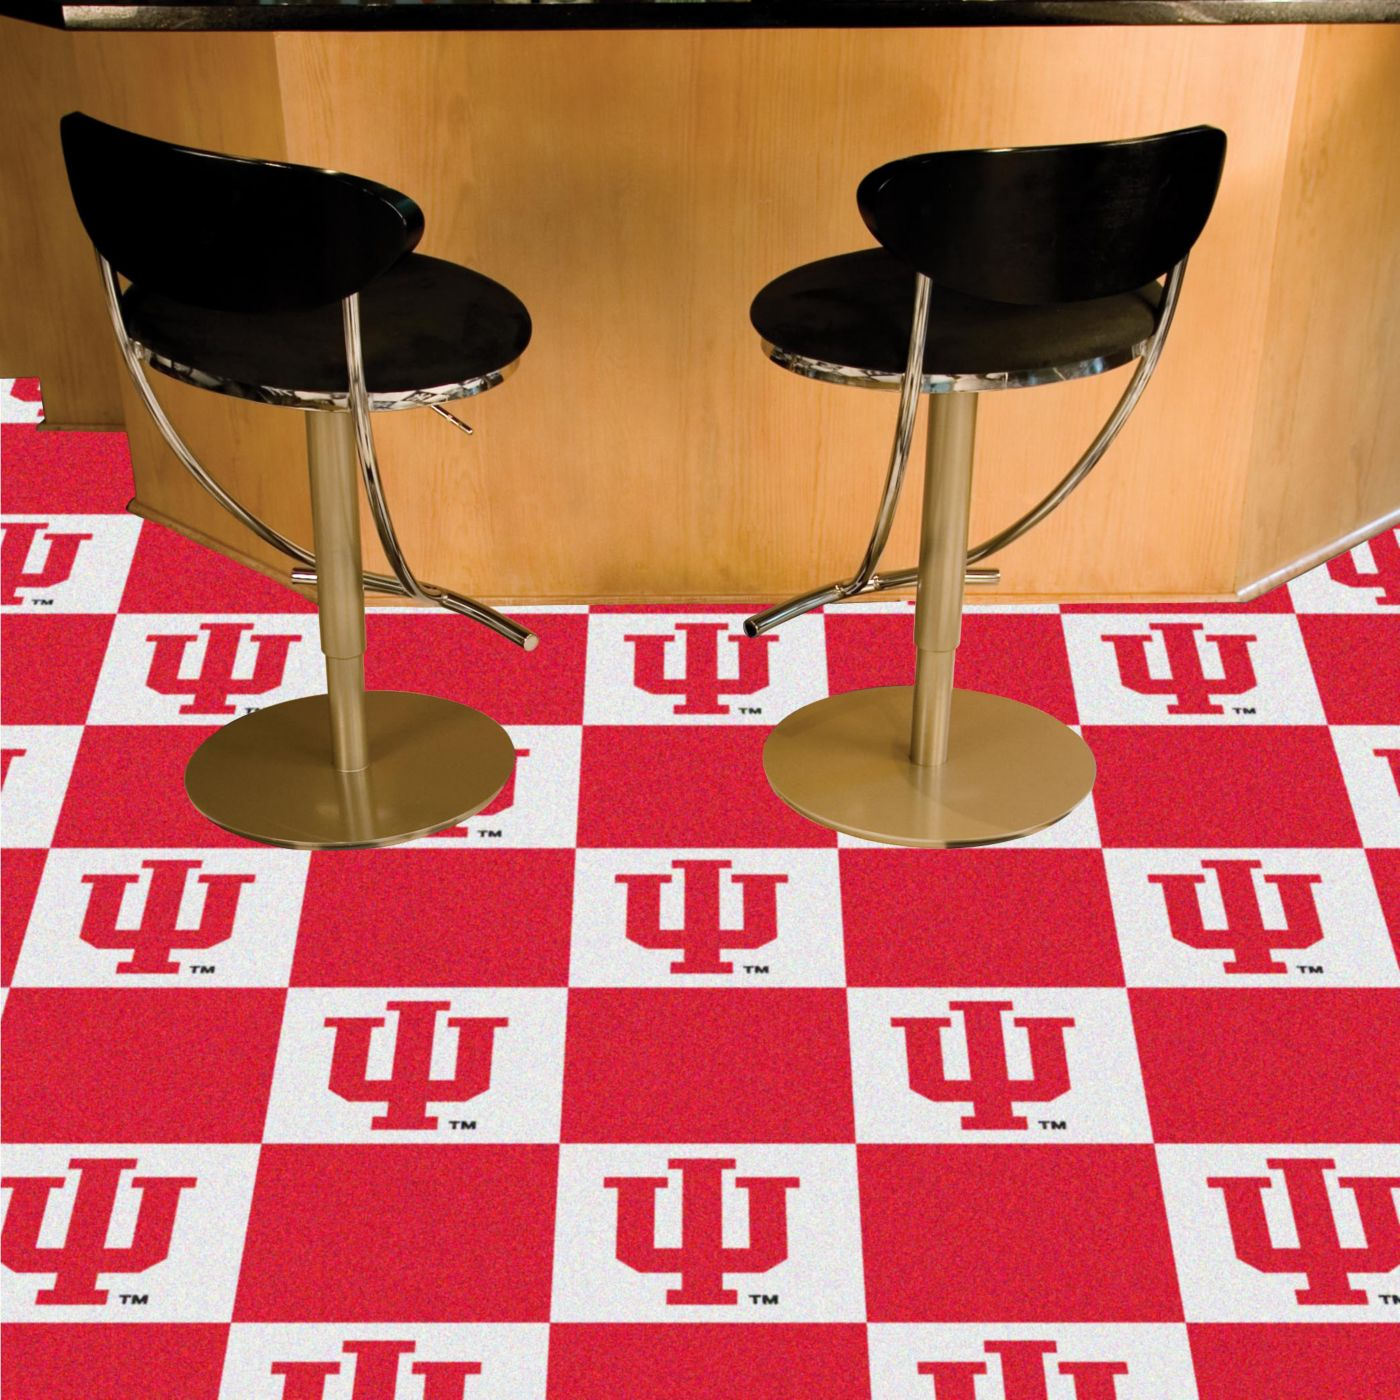 FANMATS Indiana Hoosiers Team Carpet Tiles